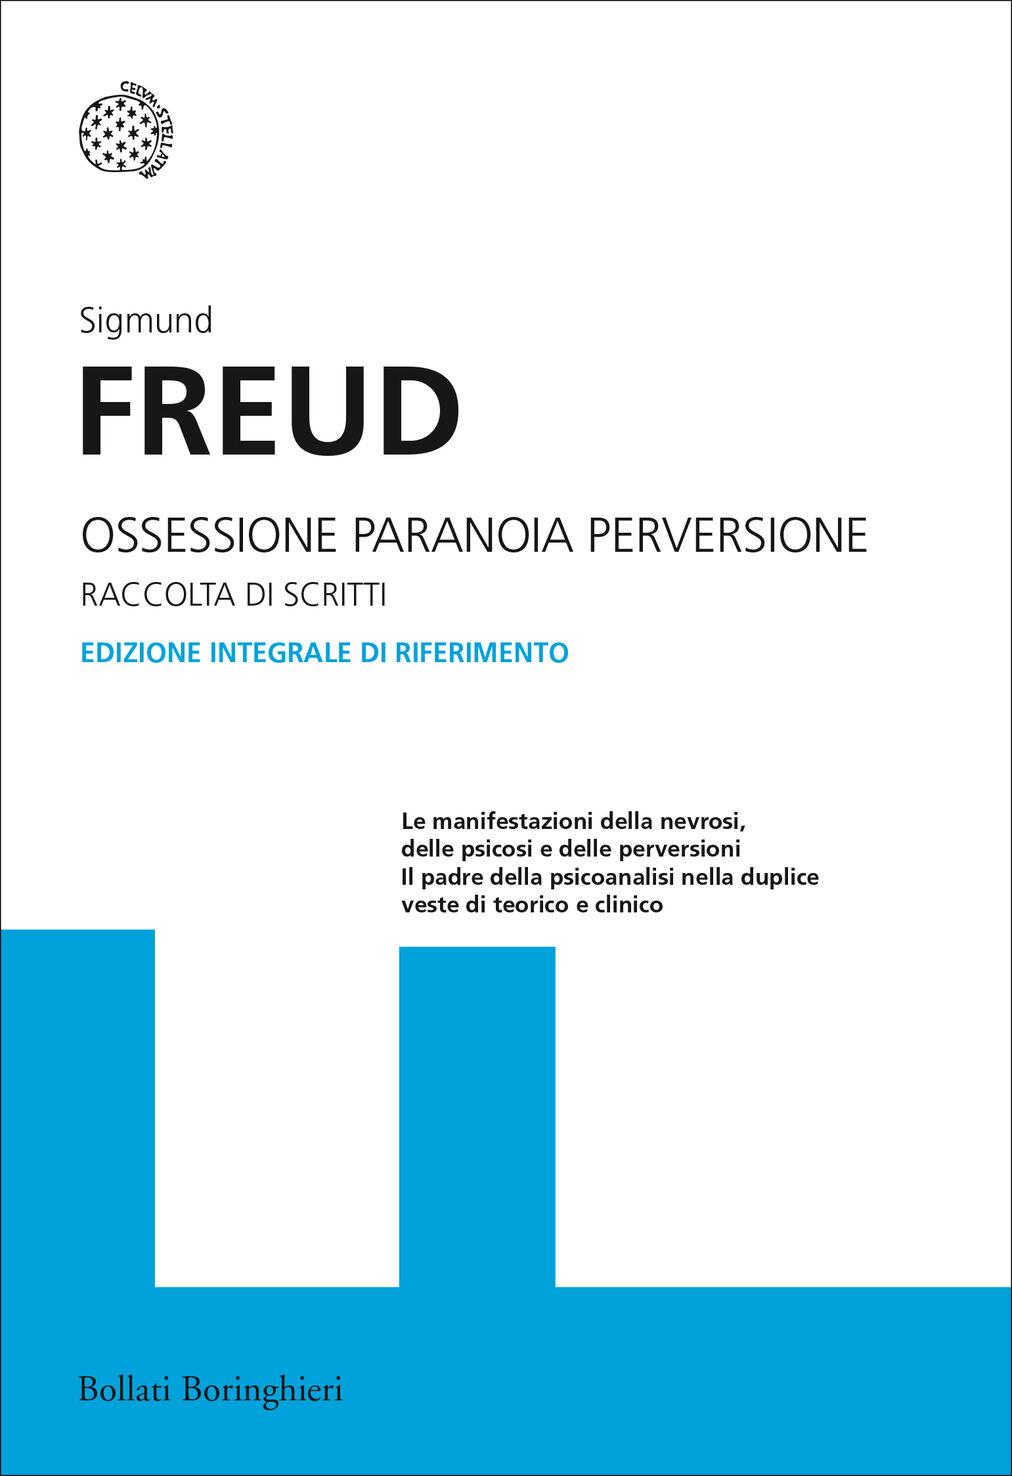 Ossessione, paranoia, perversione